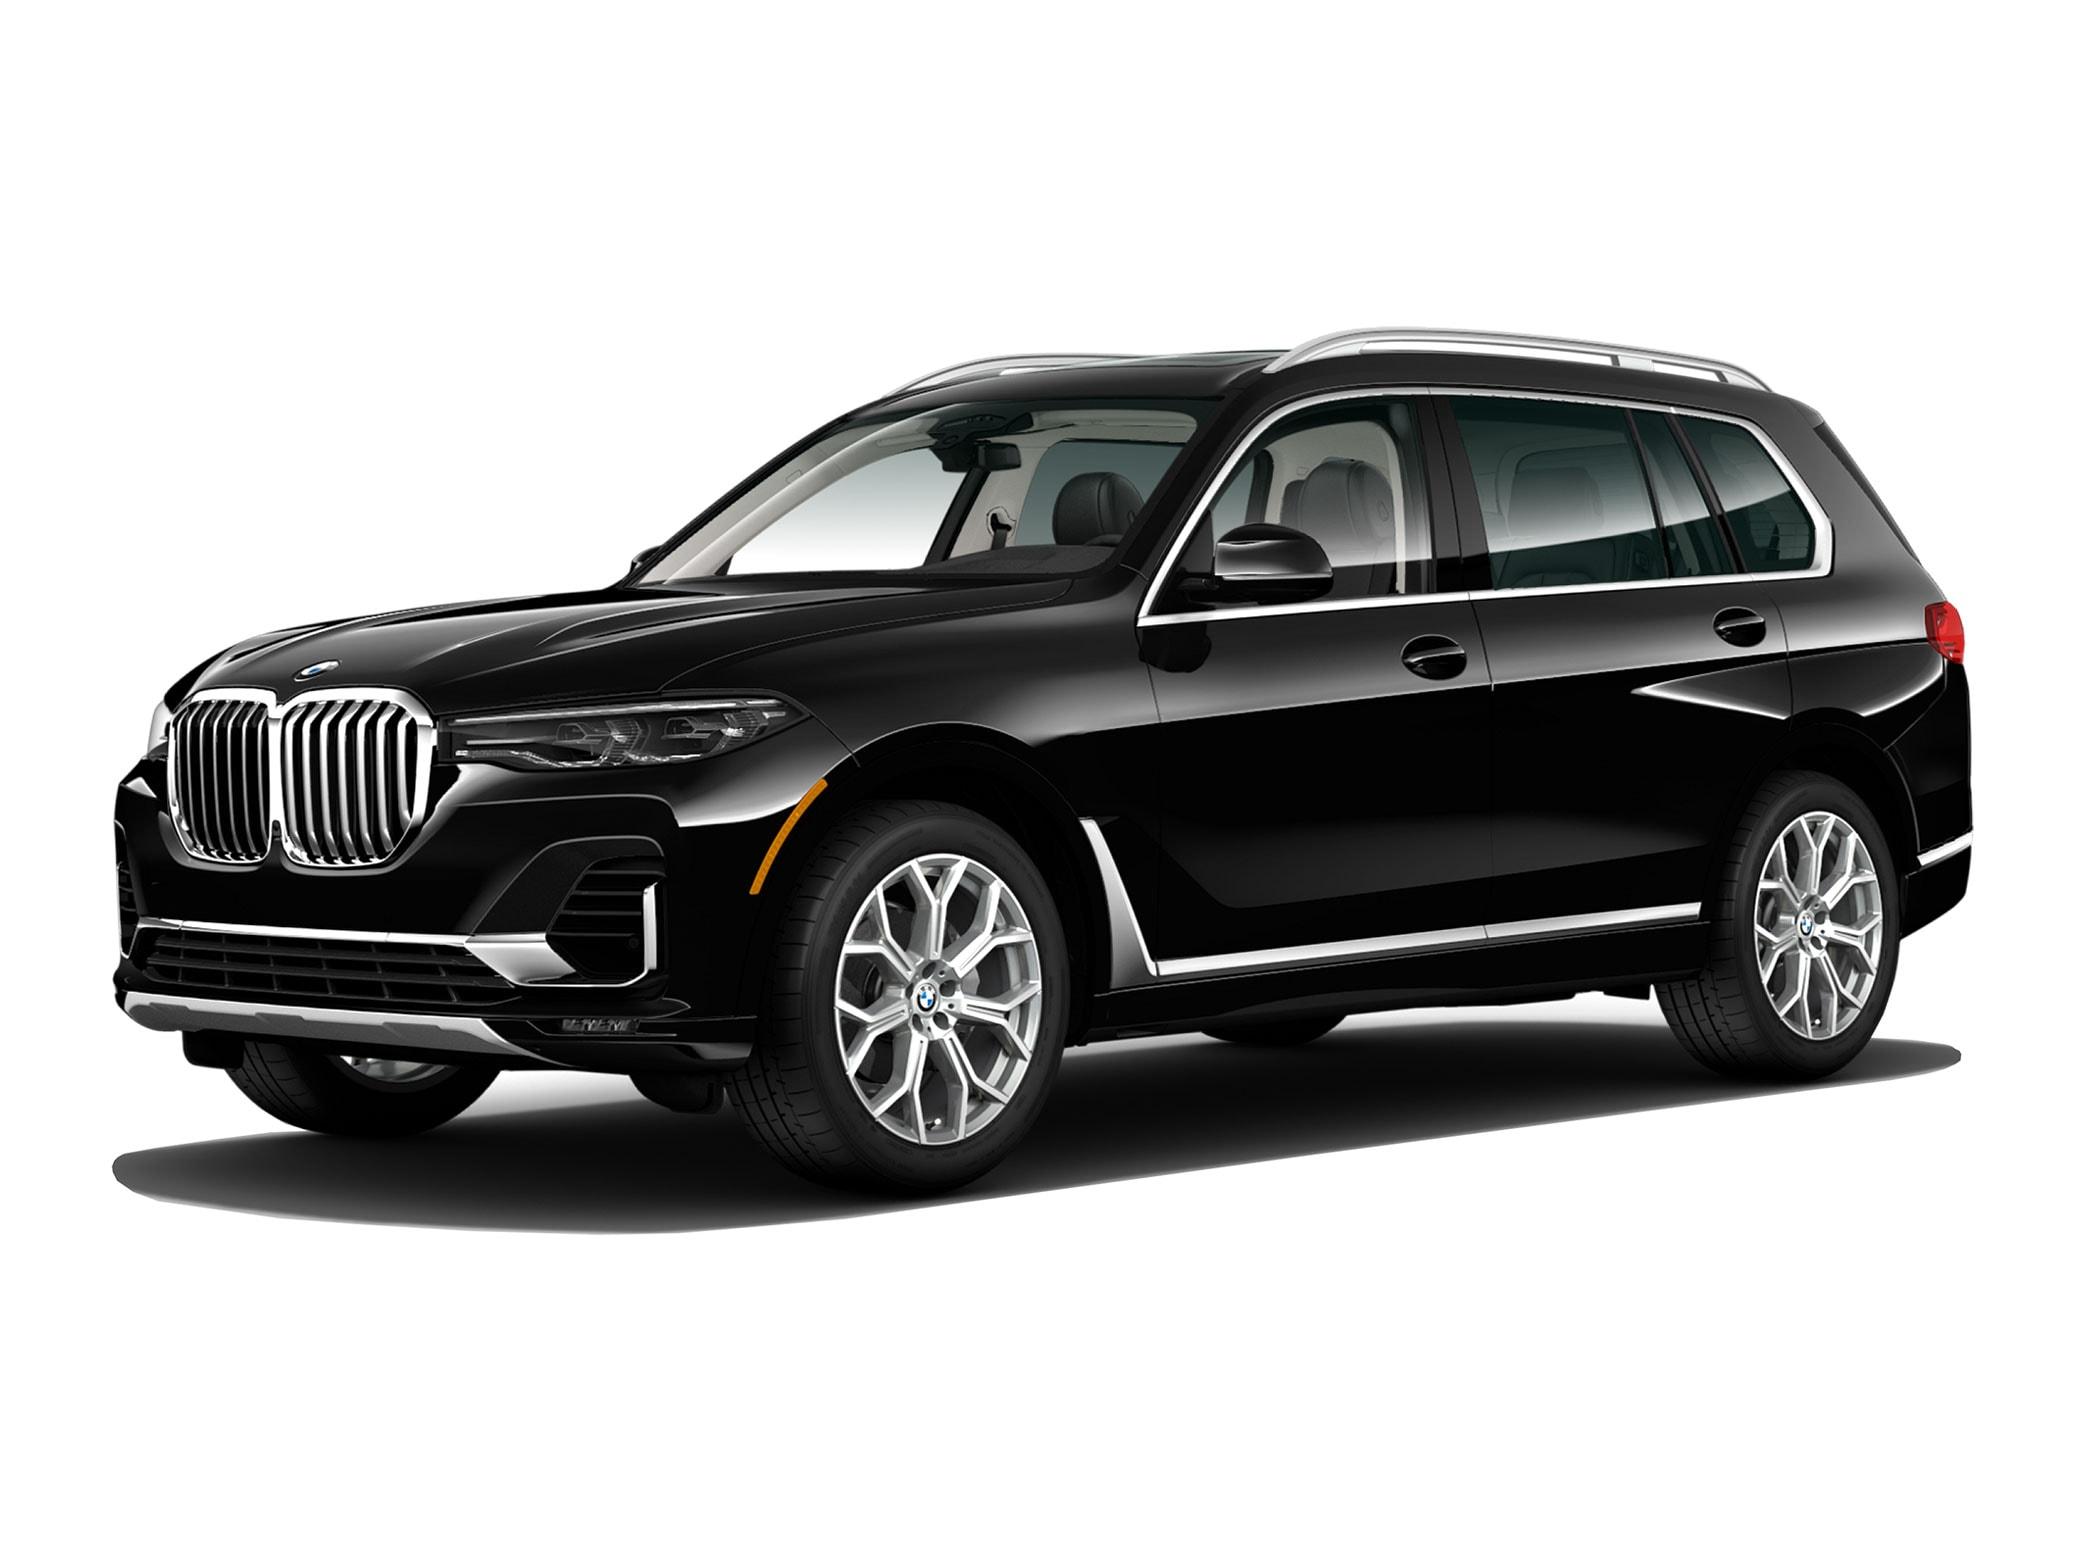 BMW X7 Sports Activity Vehicle